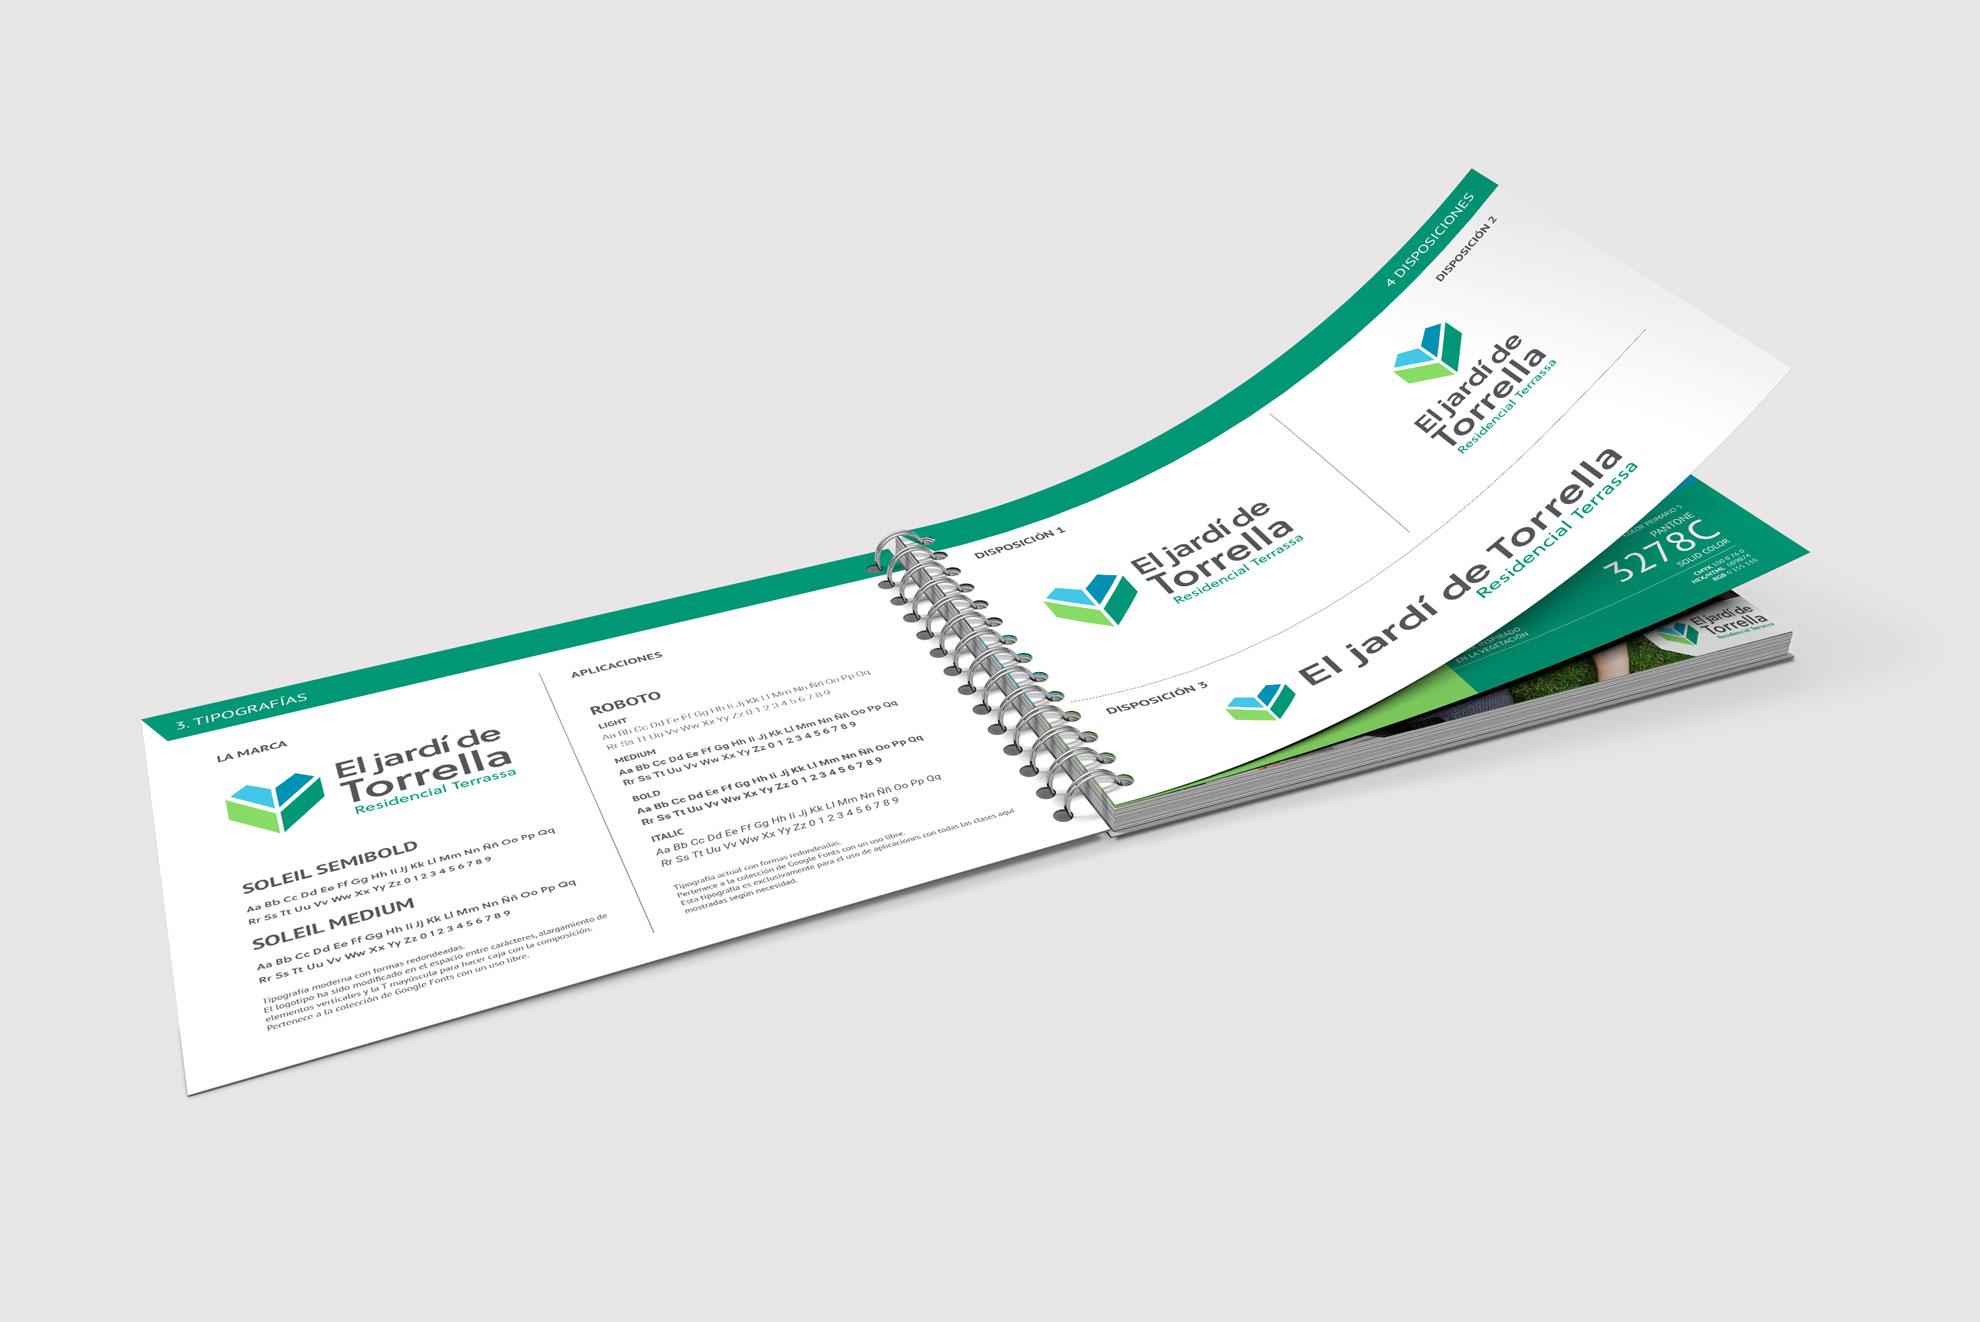 manual3 - CAMPAÑA PUBLICITARIA INMOBILIARIA